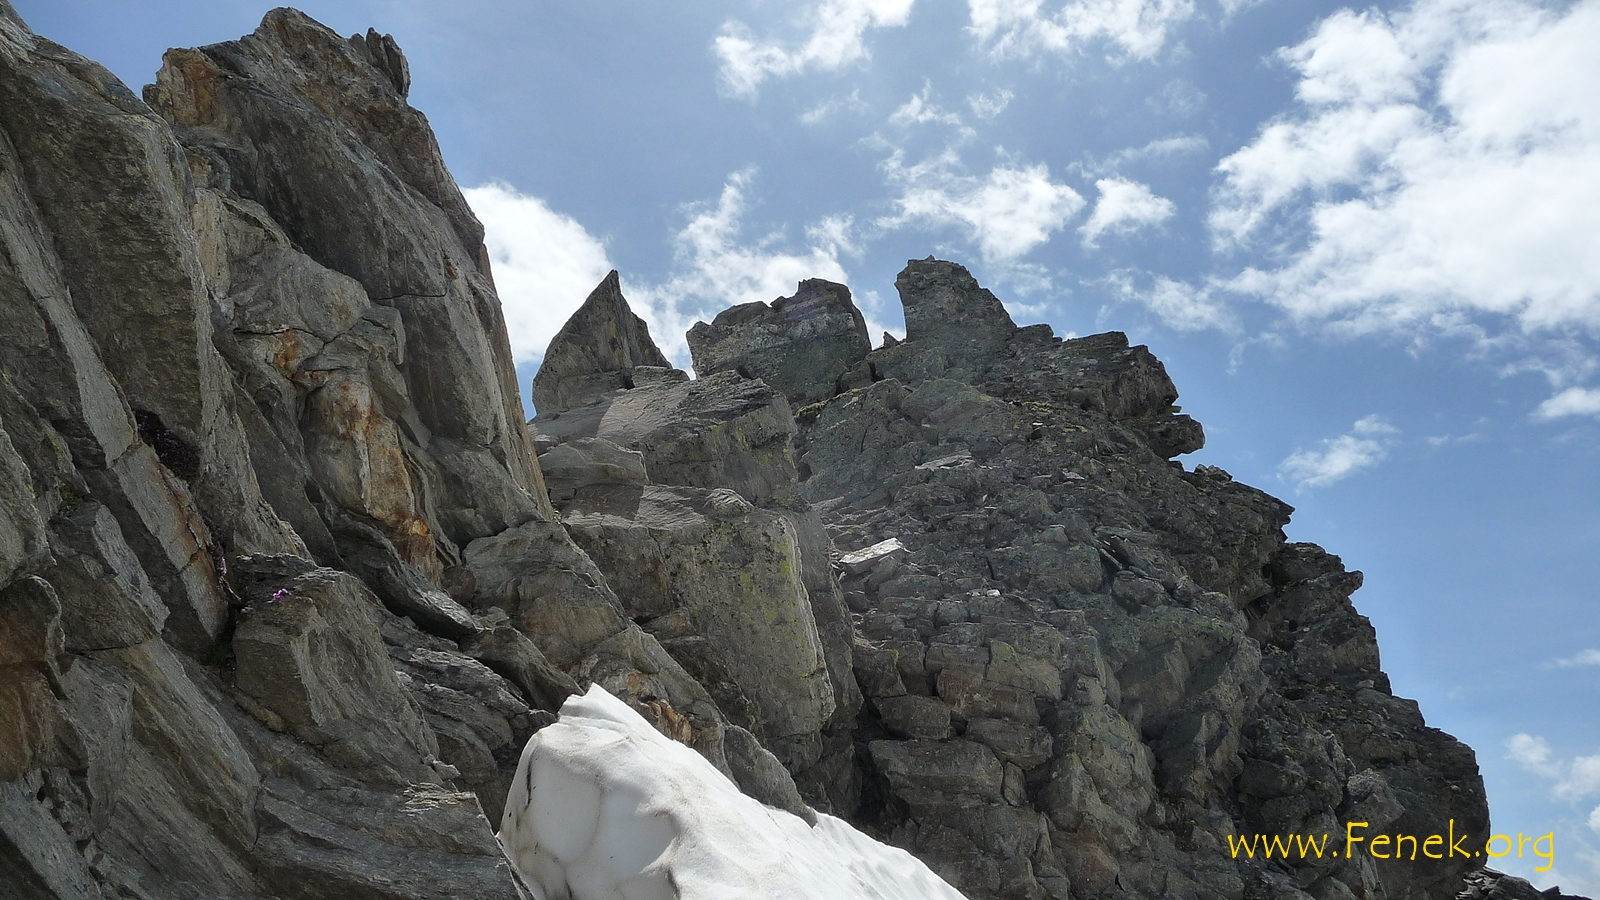 letzte Kraxelmeter zum Gipfel Pizzo Nero